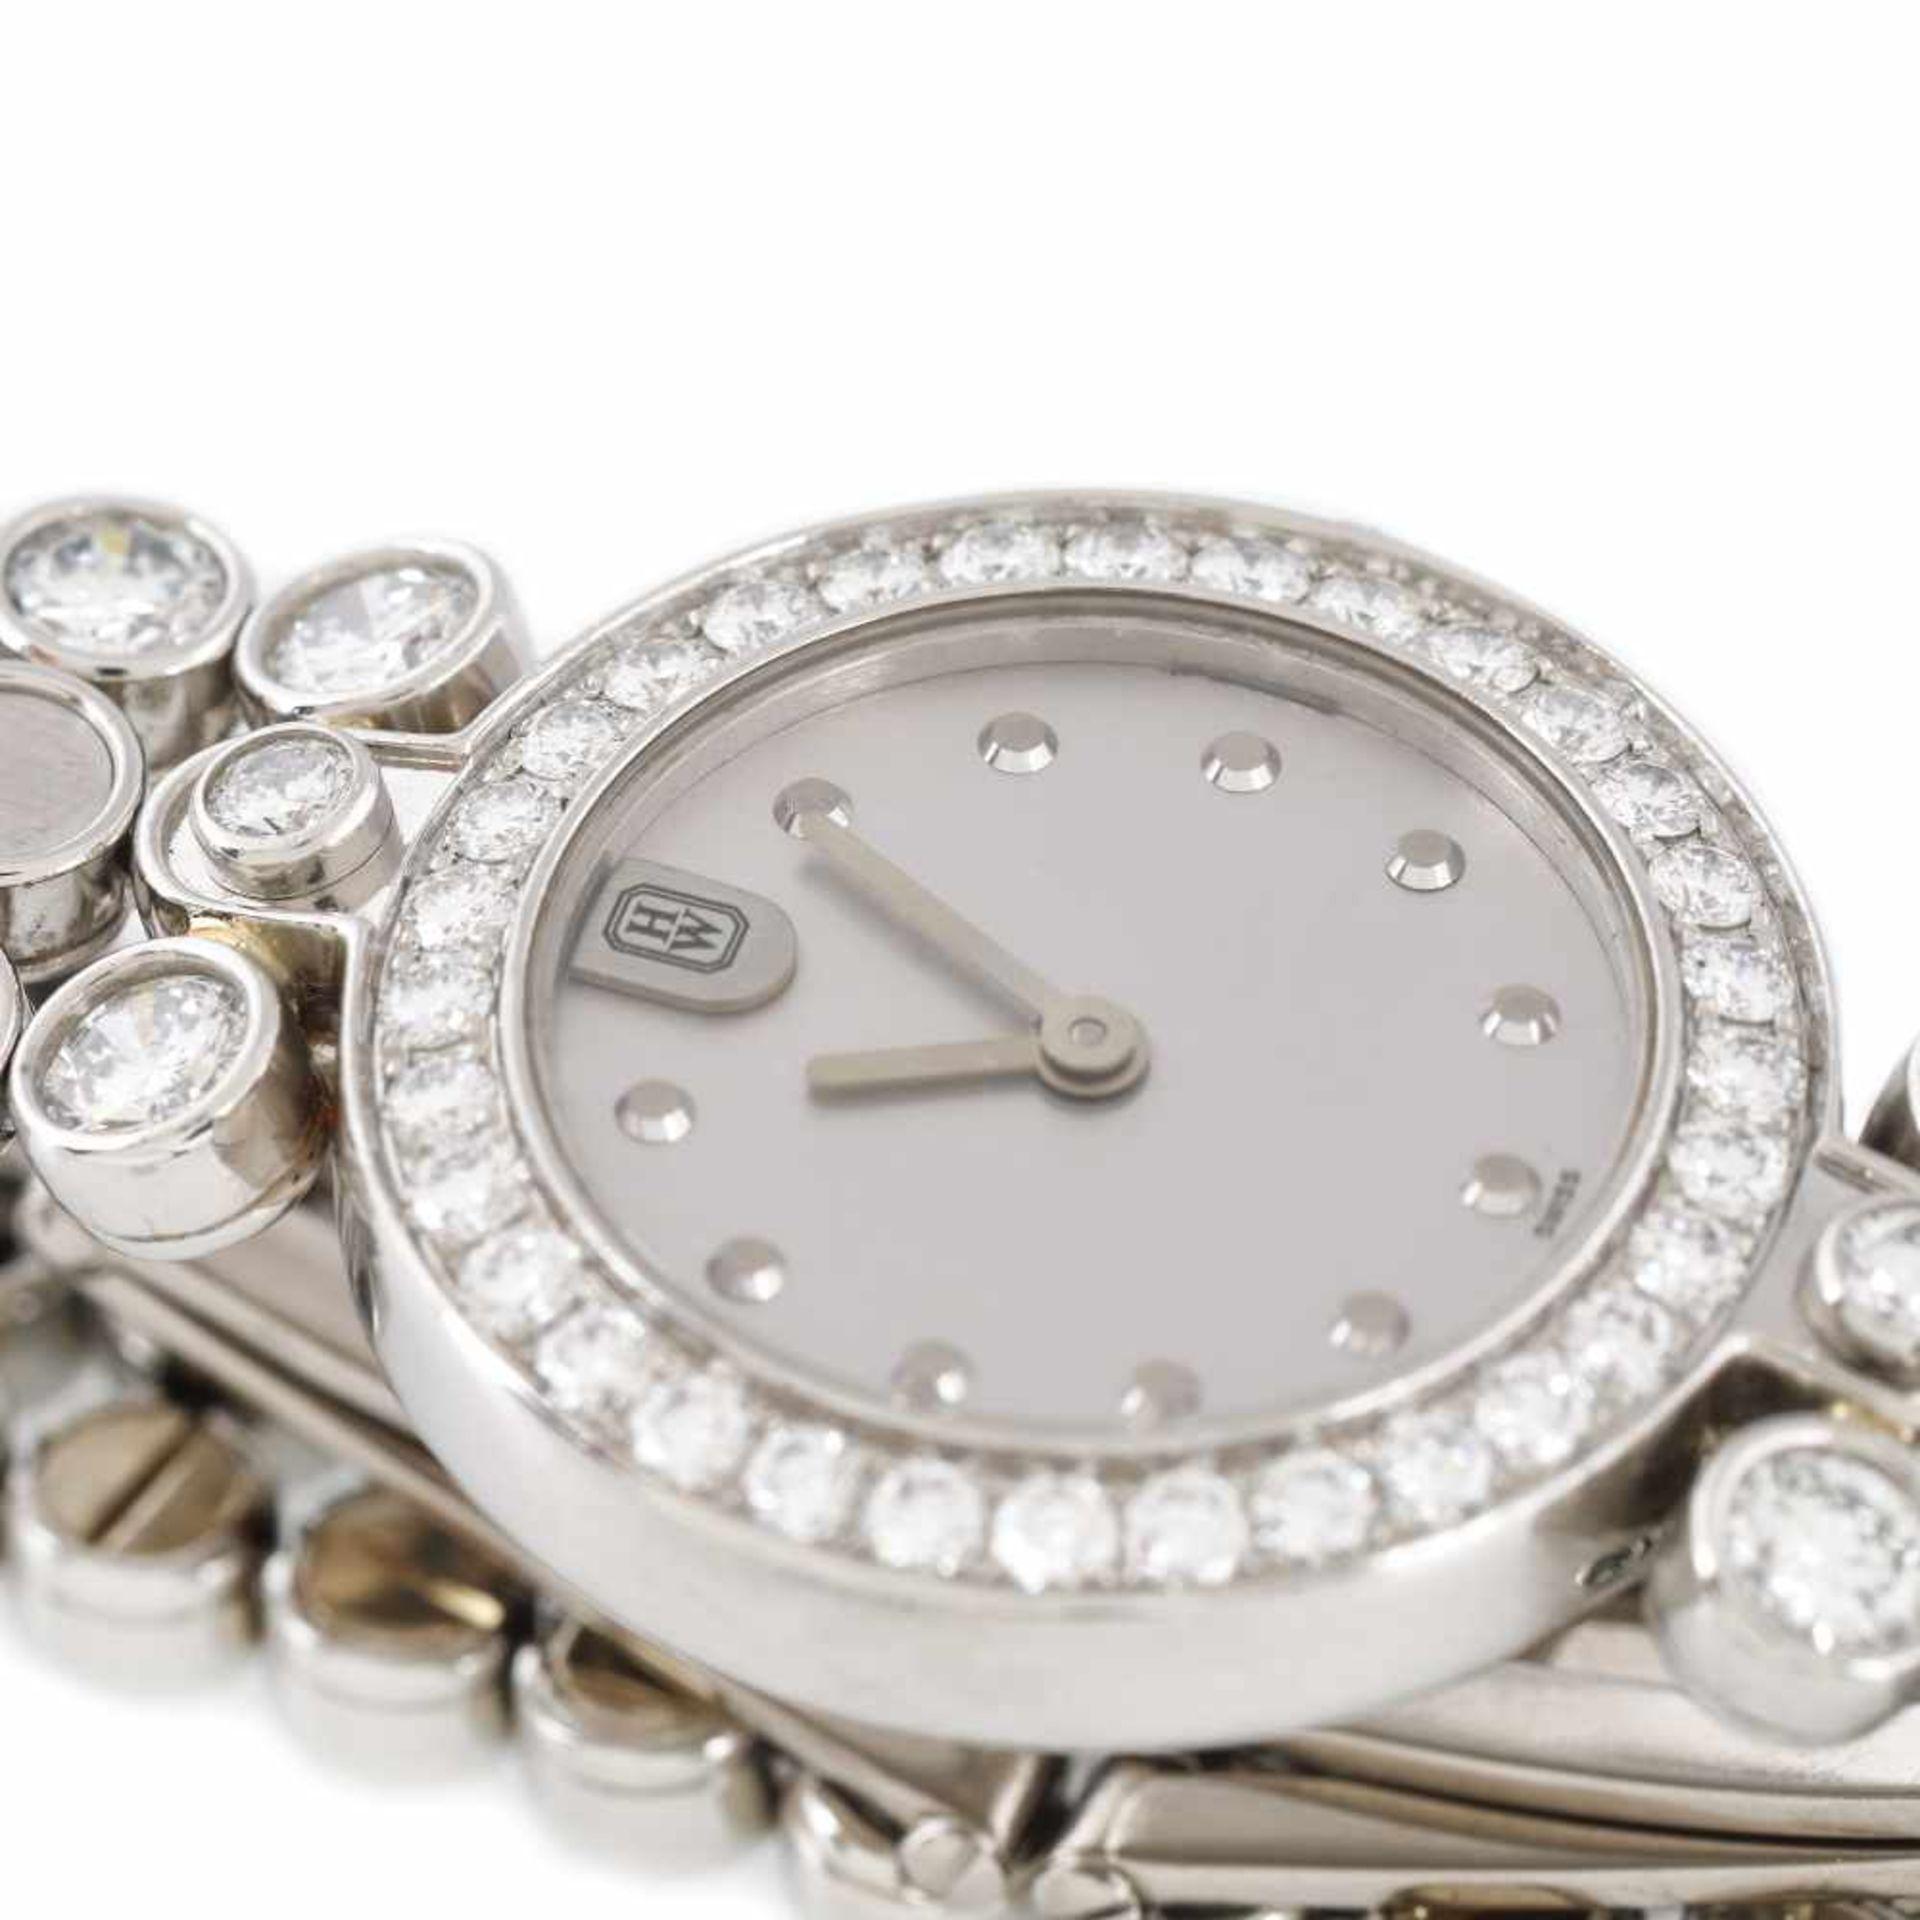 Harry Winston Premier Diamond Timepiece bracelet watch, platinum, women, decorated with diamonds, pr - Bild 2 aus 4